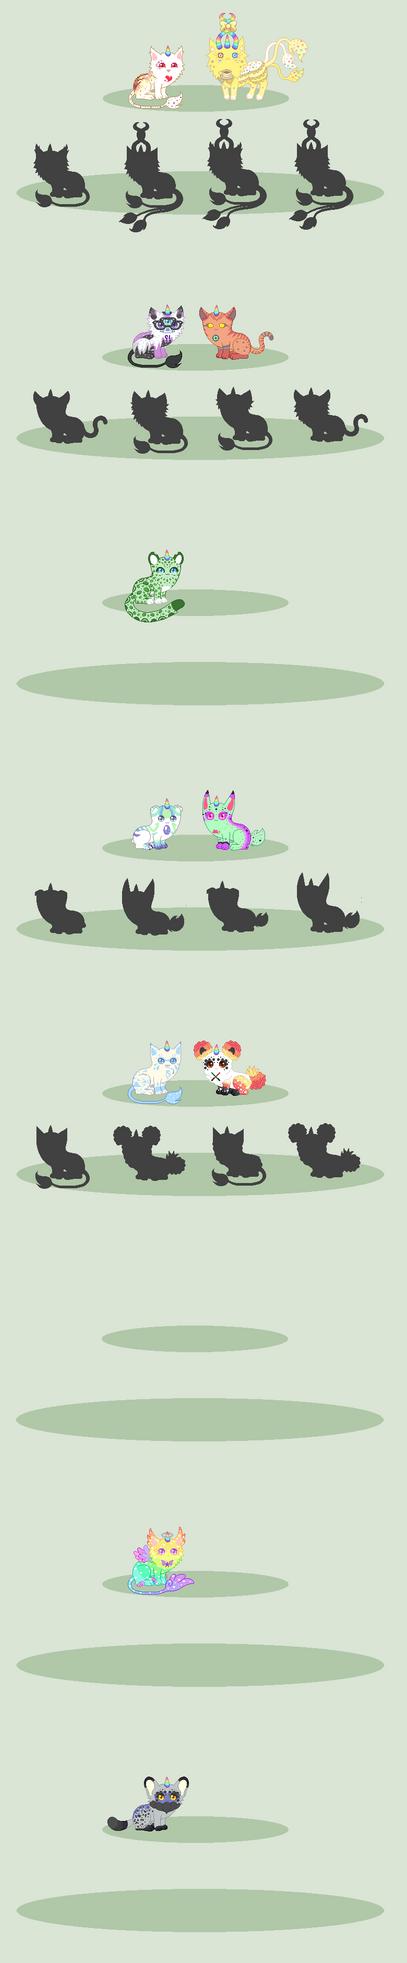 Massive Breeding Batch - WIP by xavs-pixels